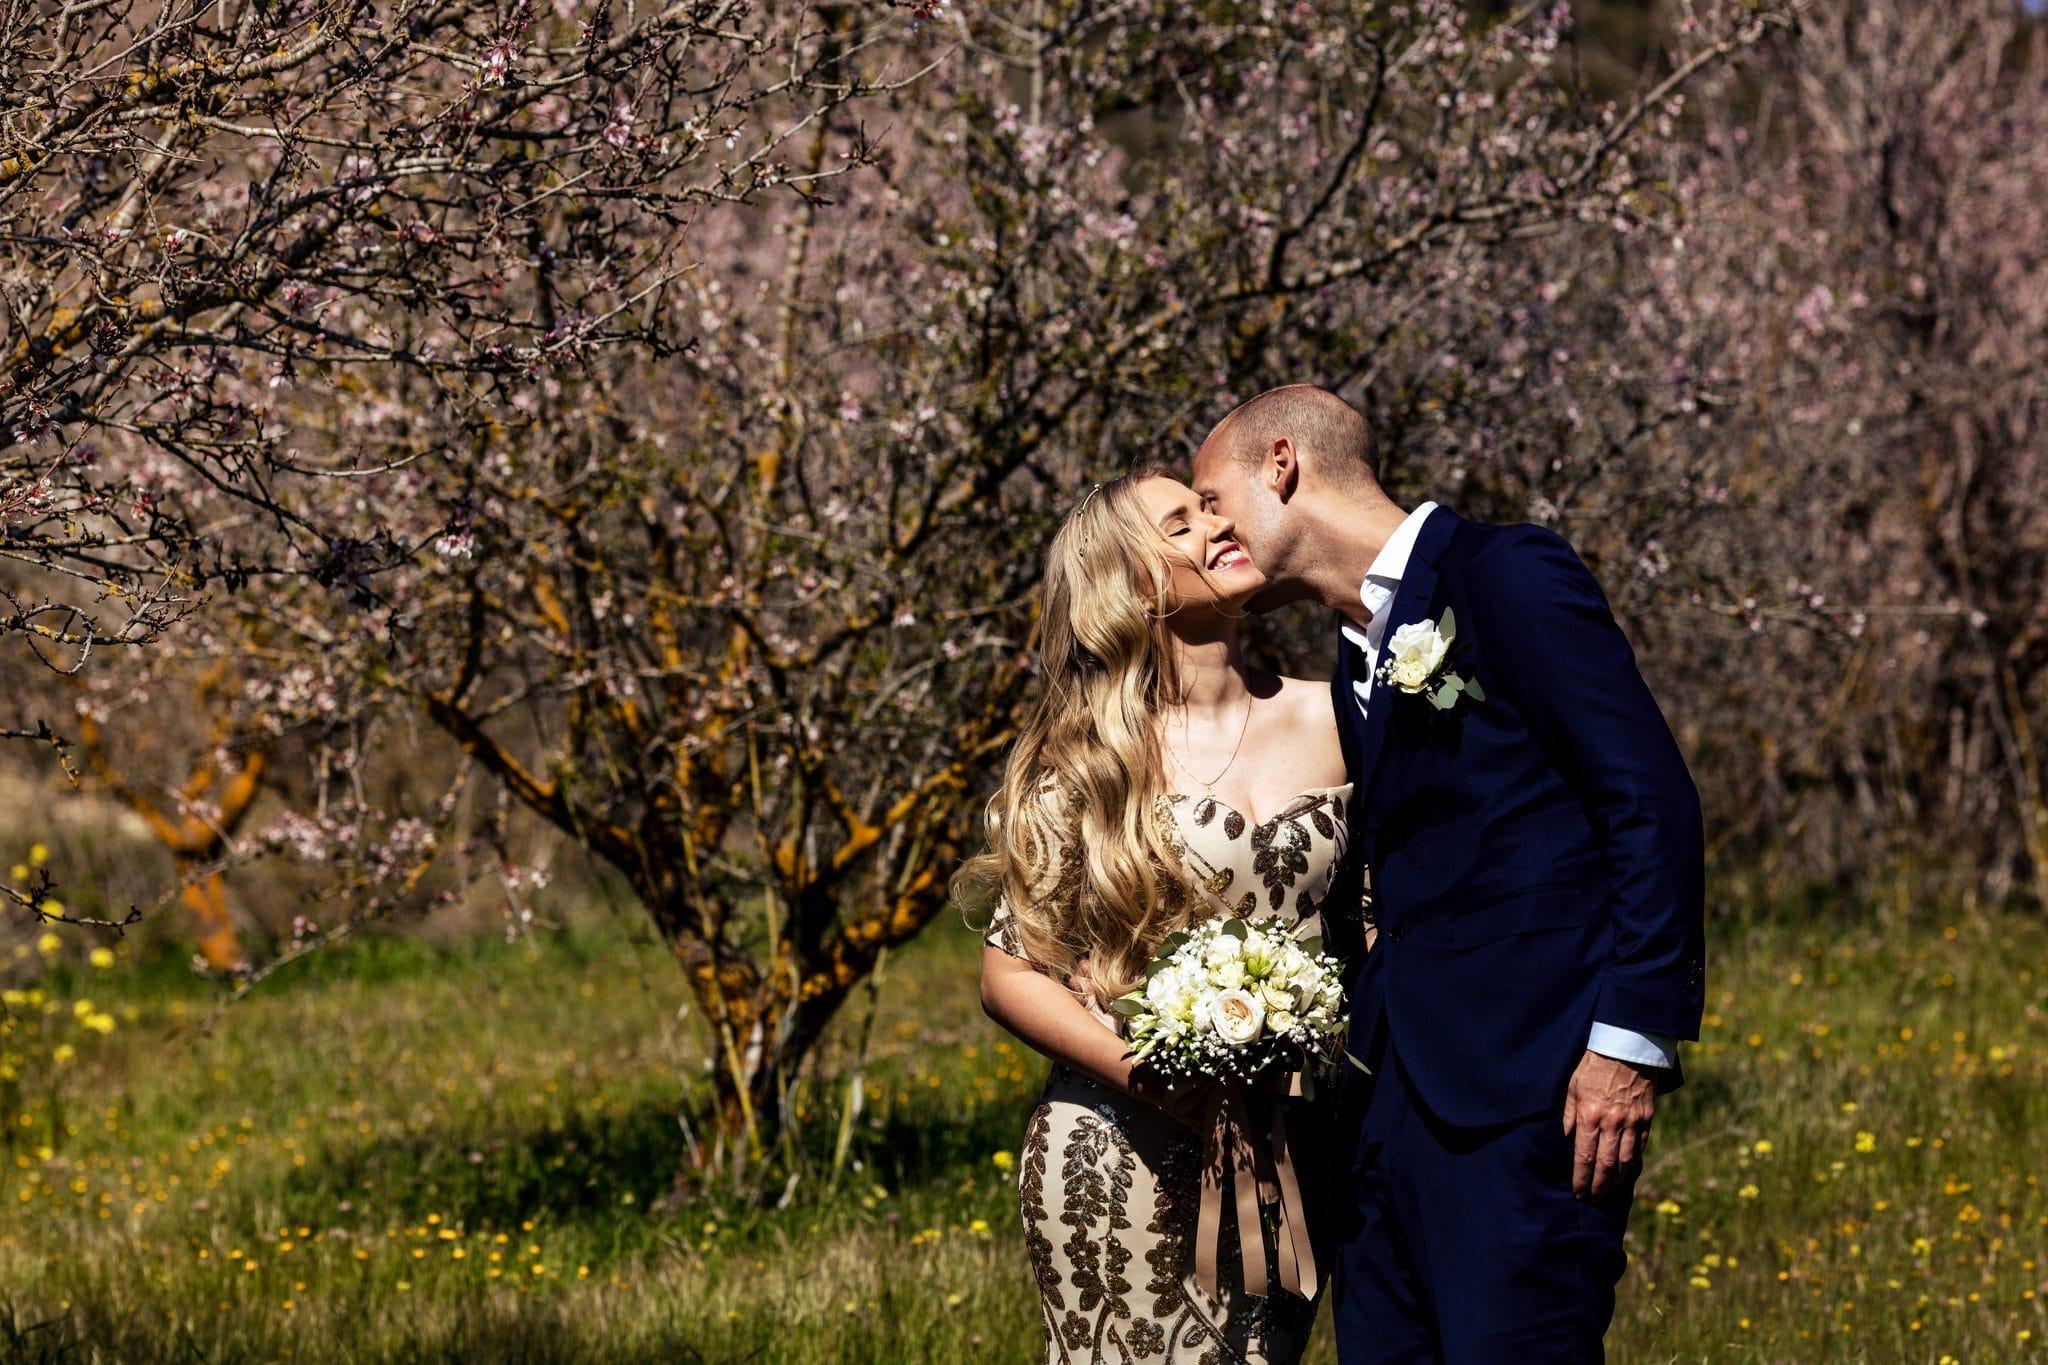 Bride and Groom Minthis Hills Paphos Cyprus Wedding